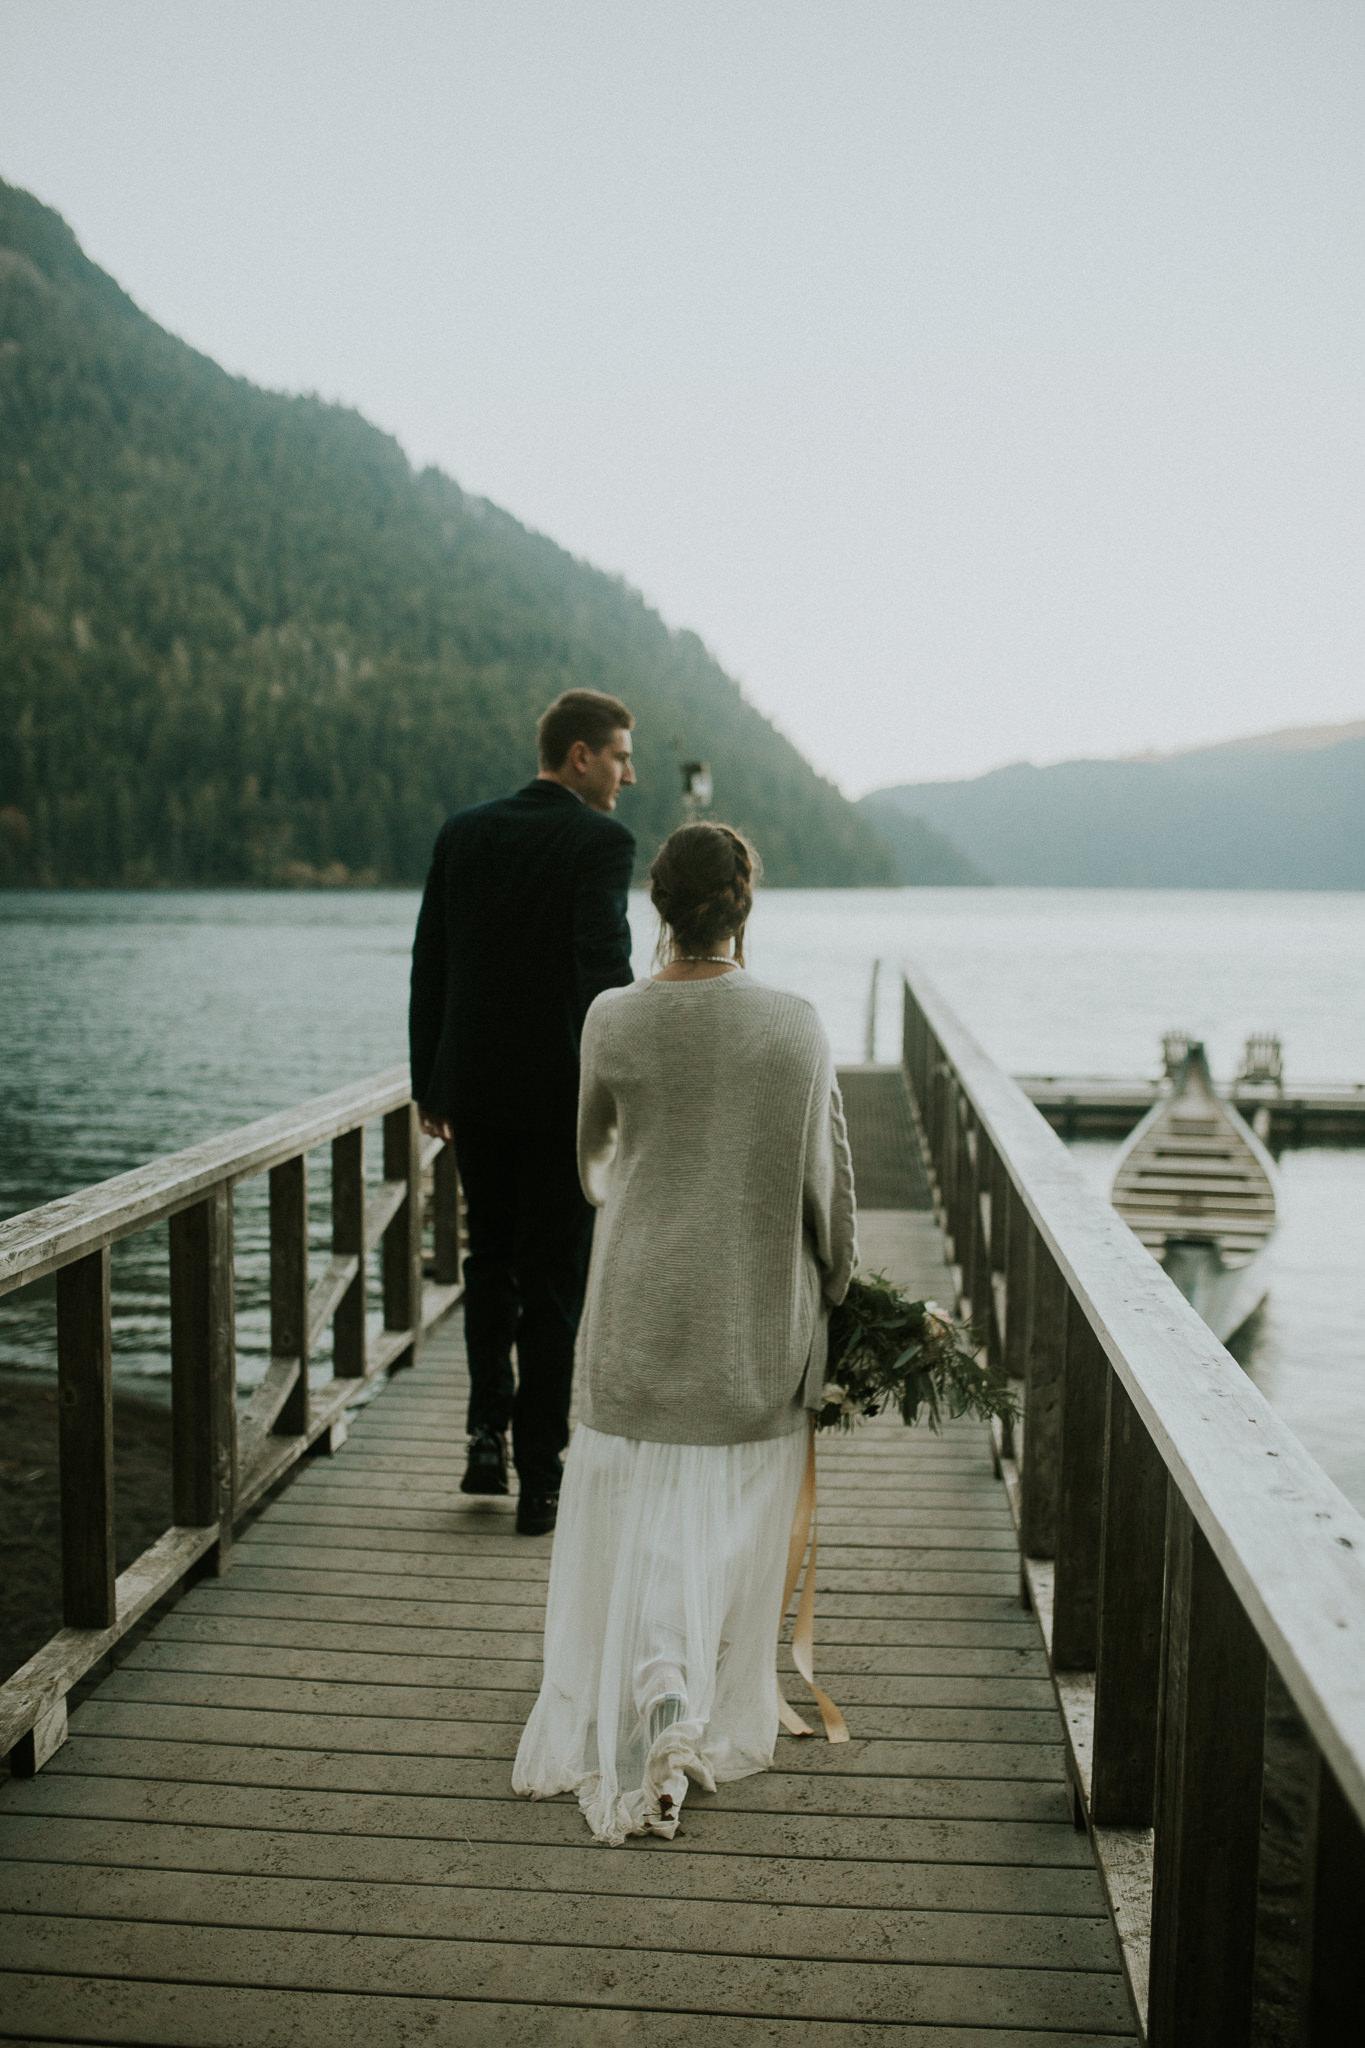 Cresent-lake-elopement-BreeAnna-Lasher-56.jpg